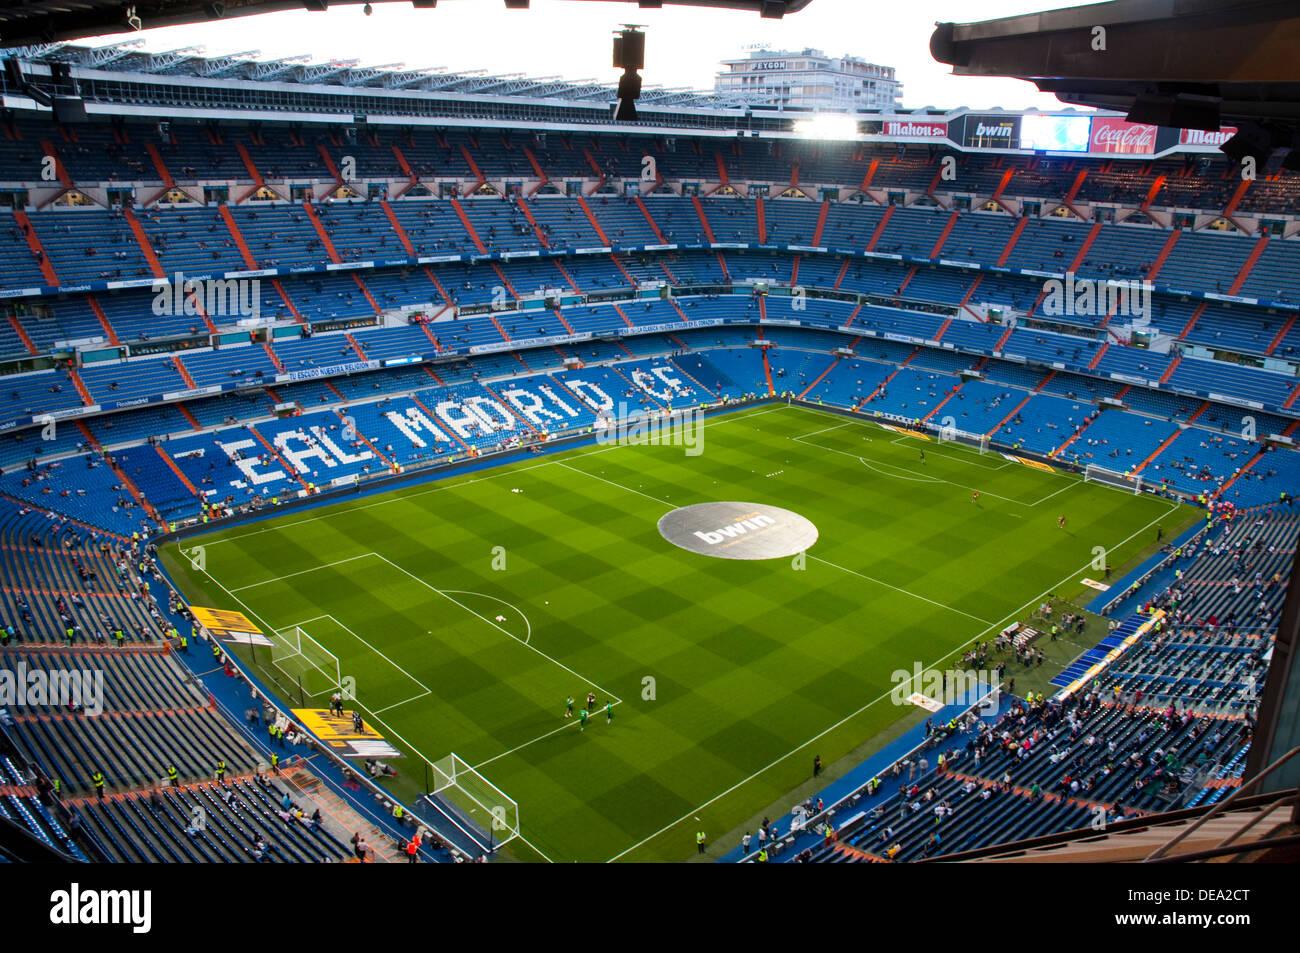 Santiago Bernabeu stadium before football match. Madrid, Spain. - Stock Image